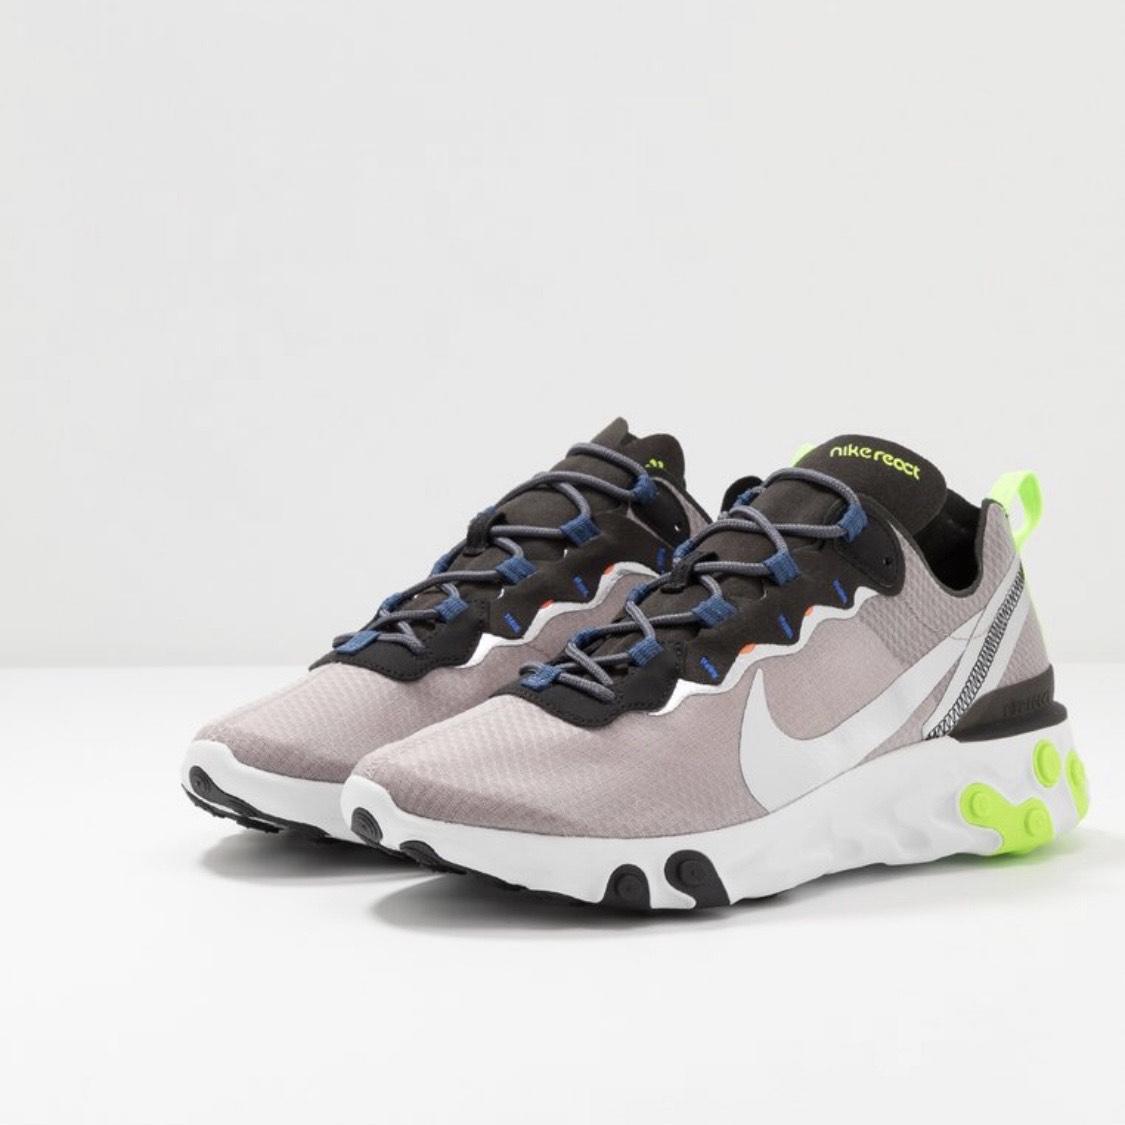 Nike React 55 SE (38.5/47.5)